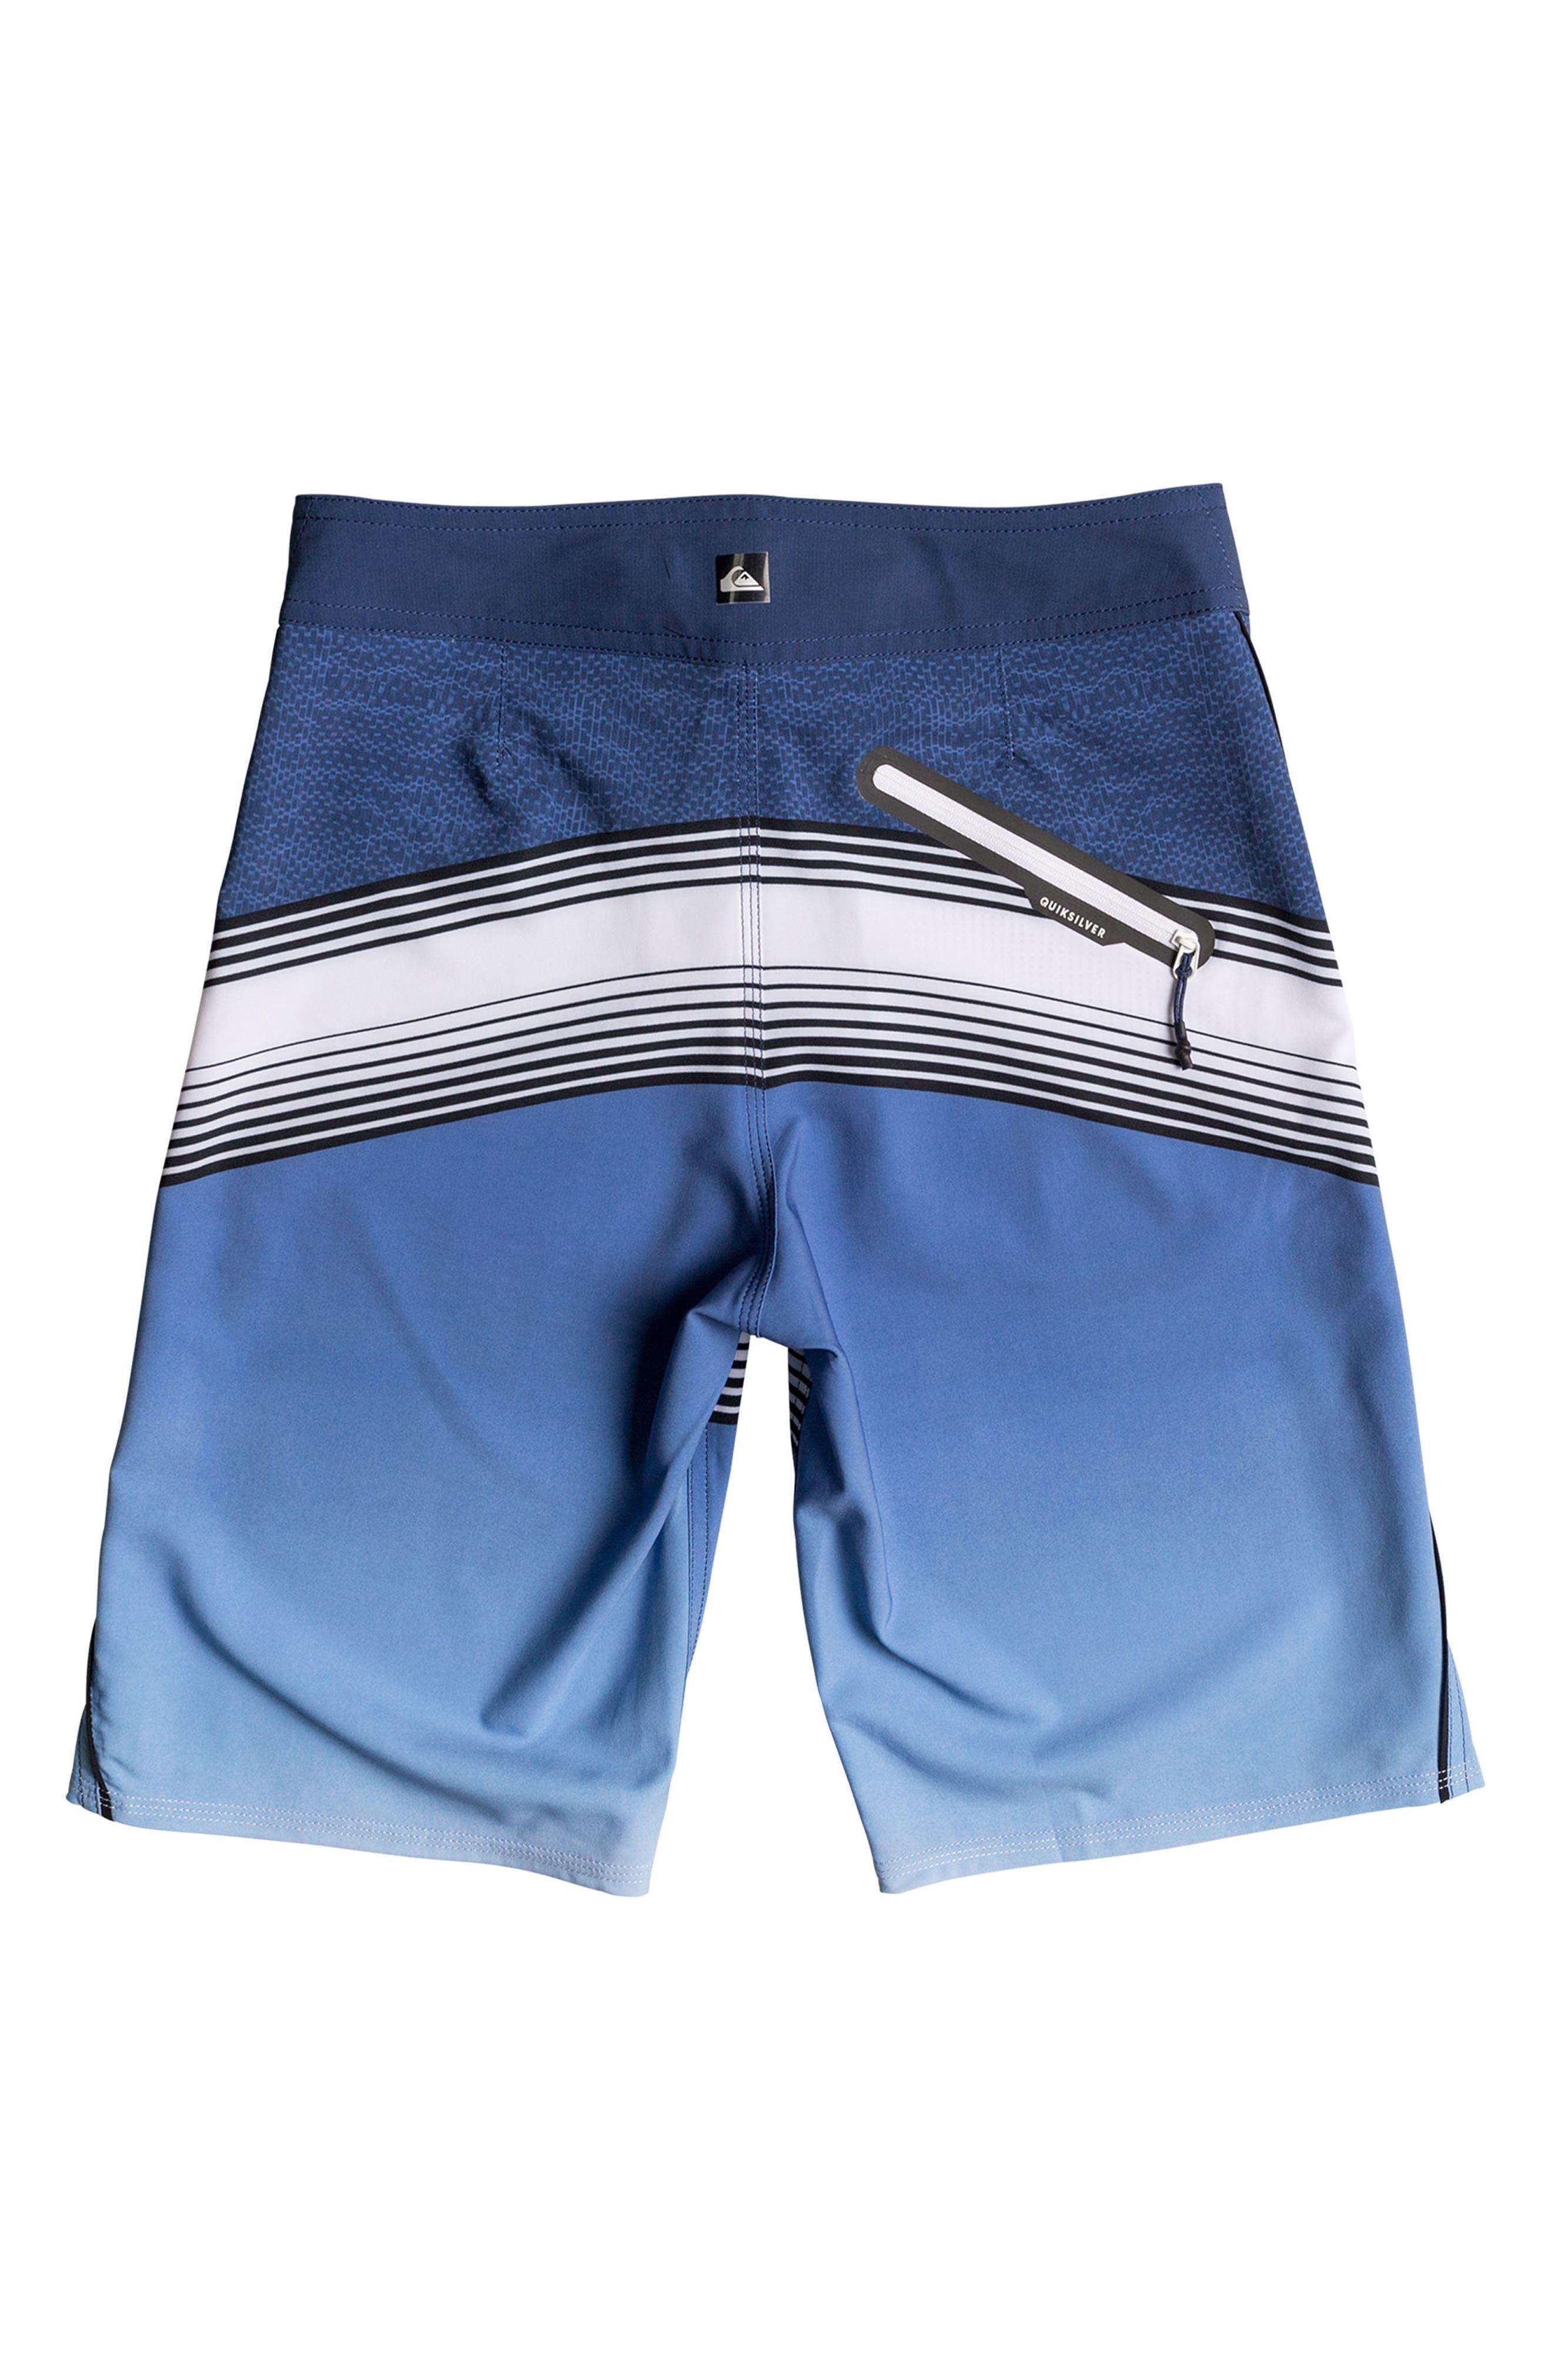 Division Fade Board Shorts,                             Alternate thumbnail 2, color,                             401